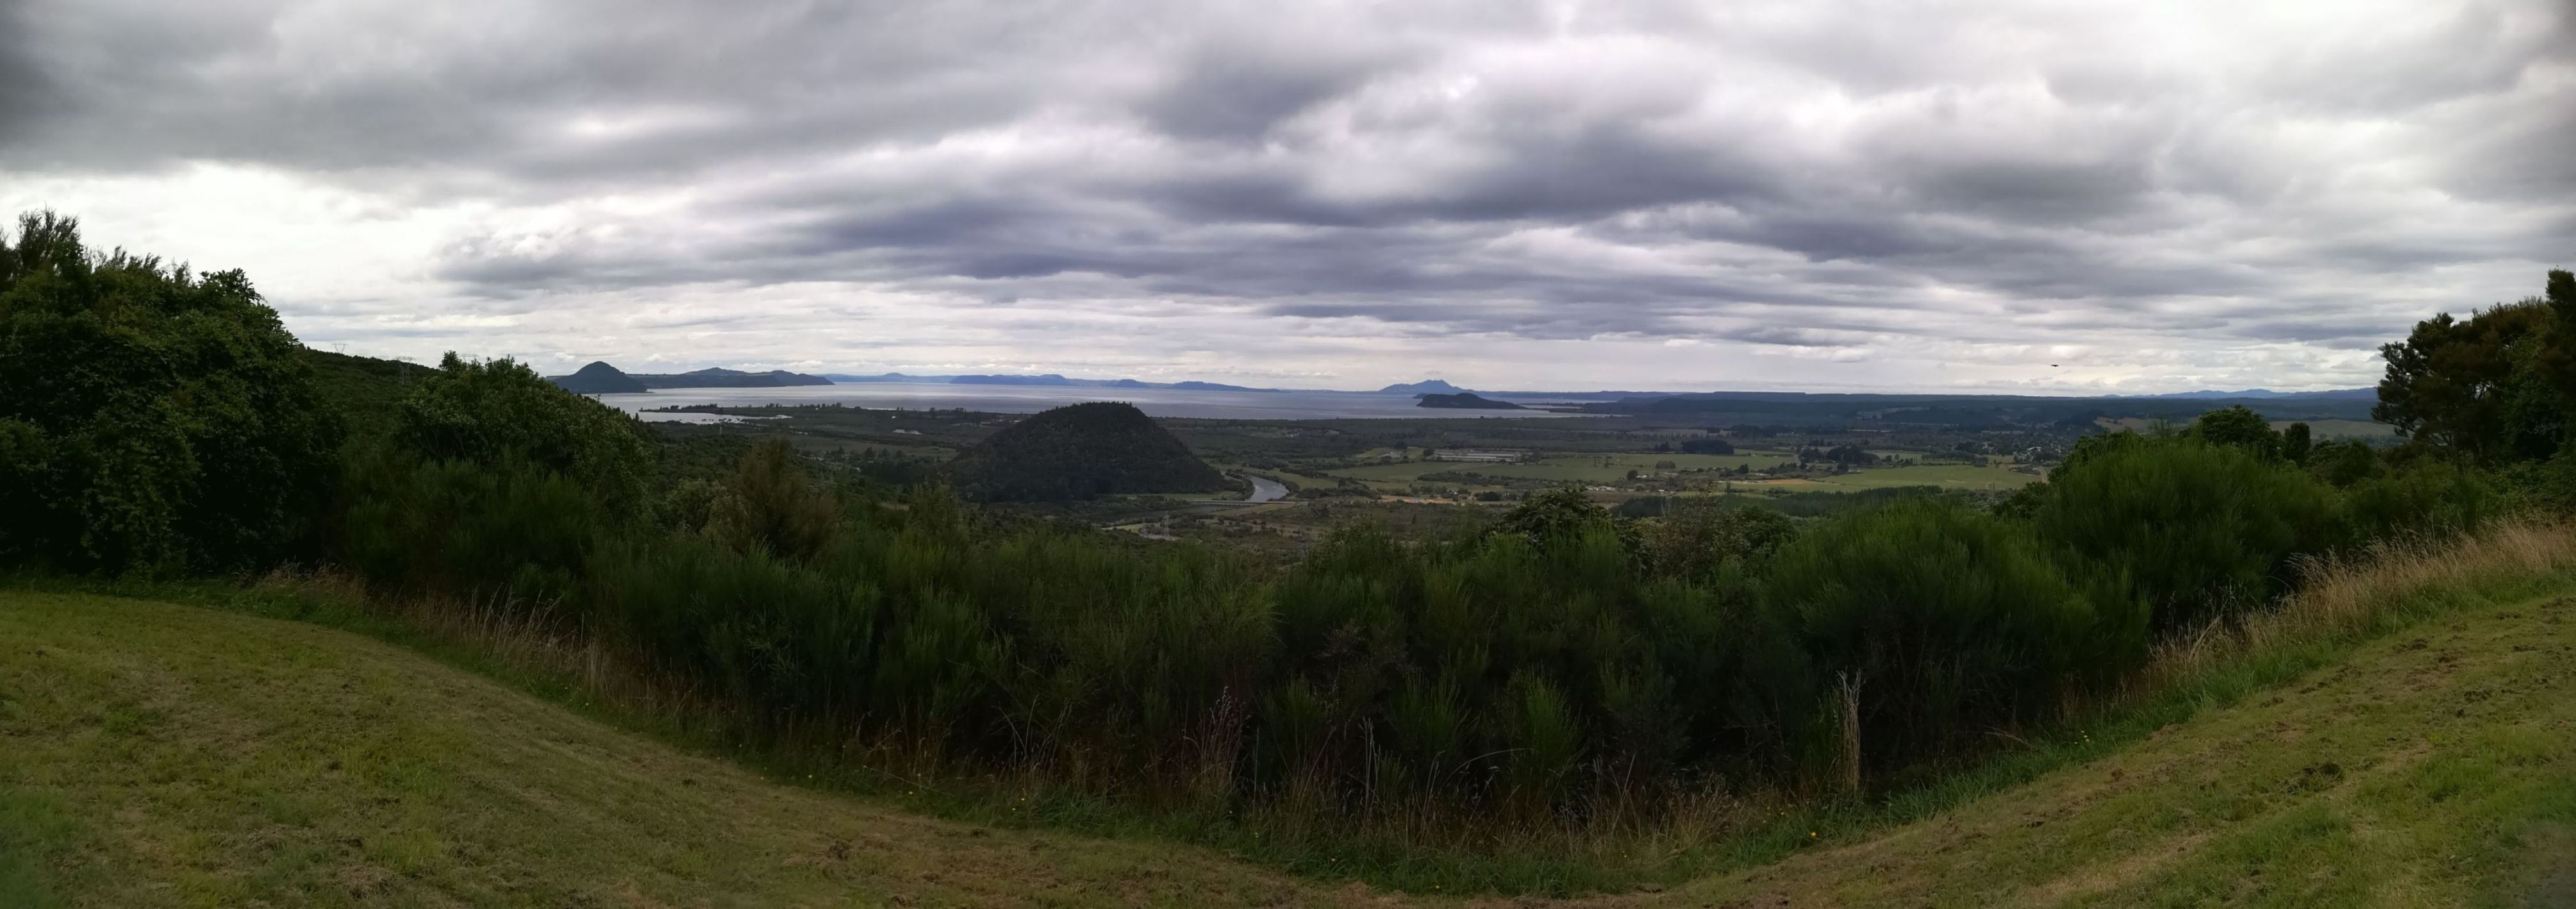 Pohľad na jazero Taupo